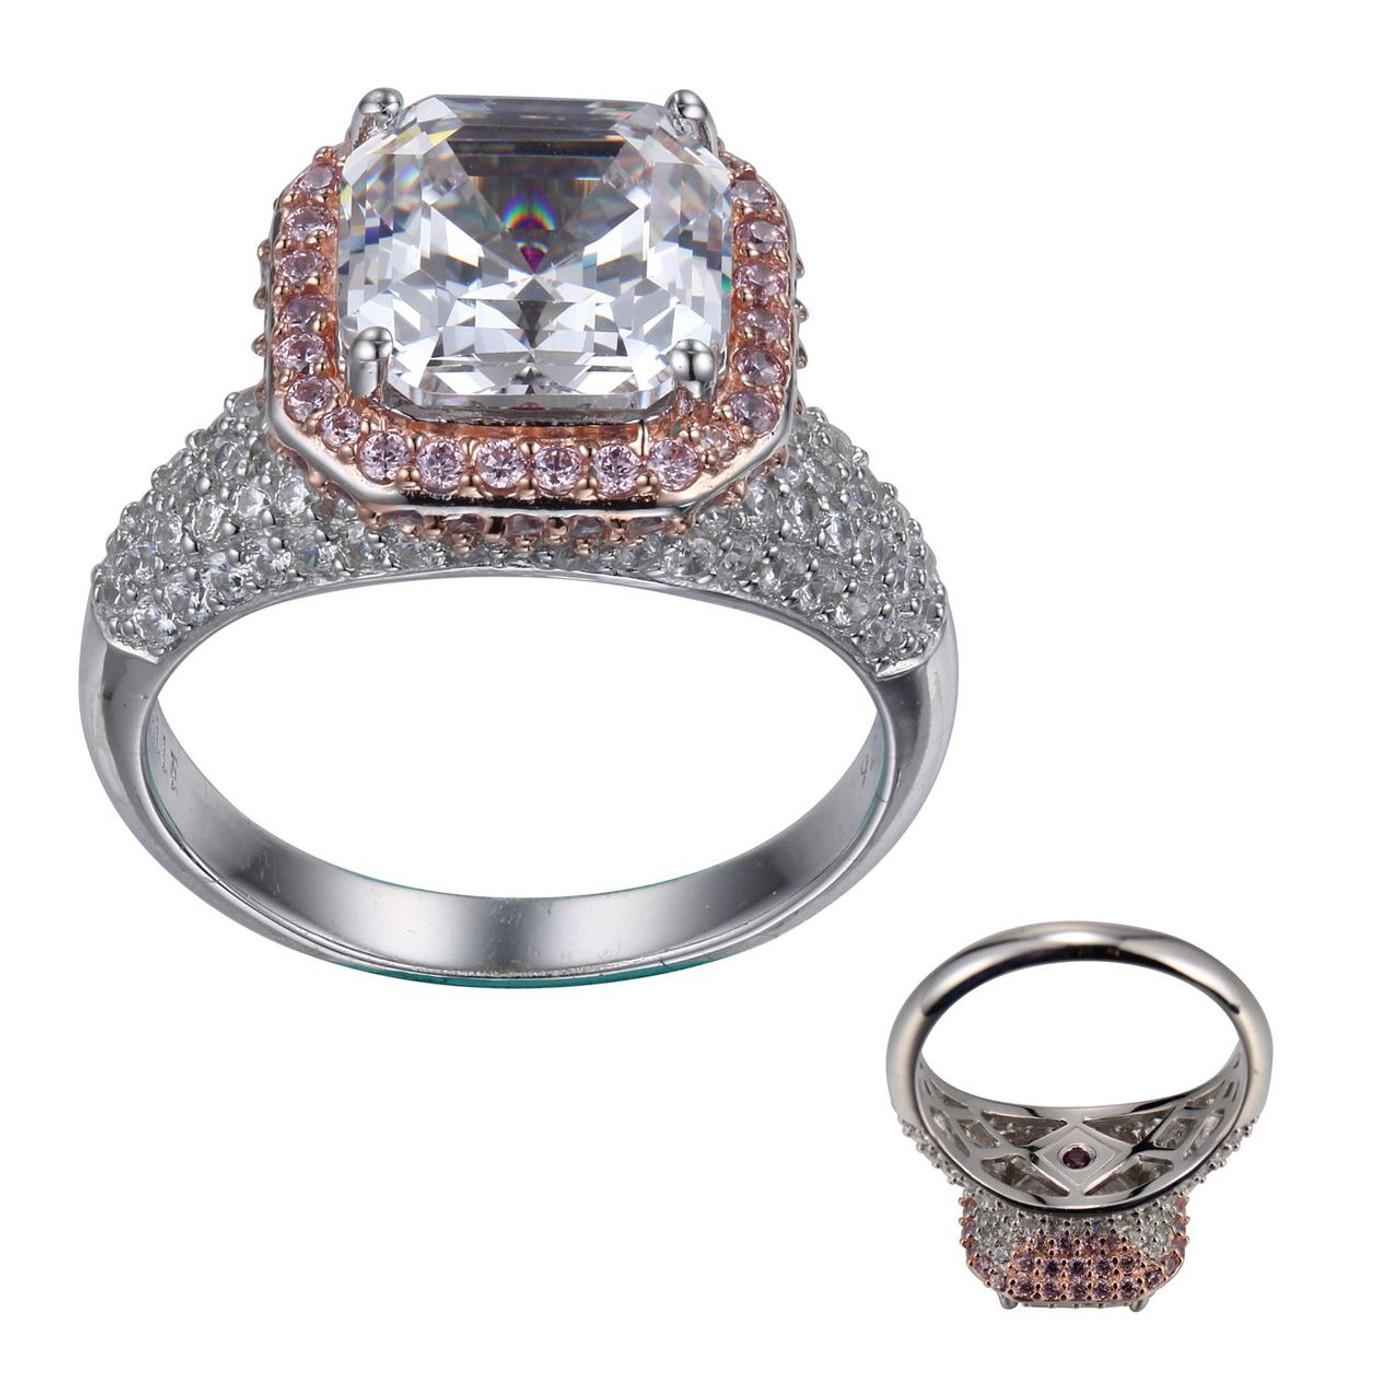 Elle Sterling Silver 2 tone (Rose) CZ Asscher Cut w/Clear & Pink CZs Ring